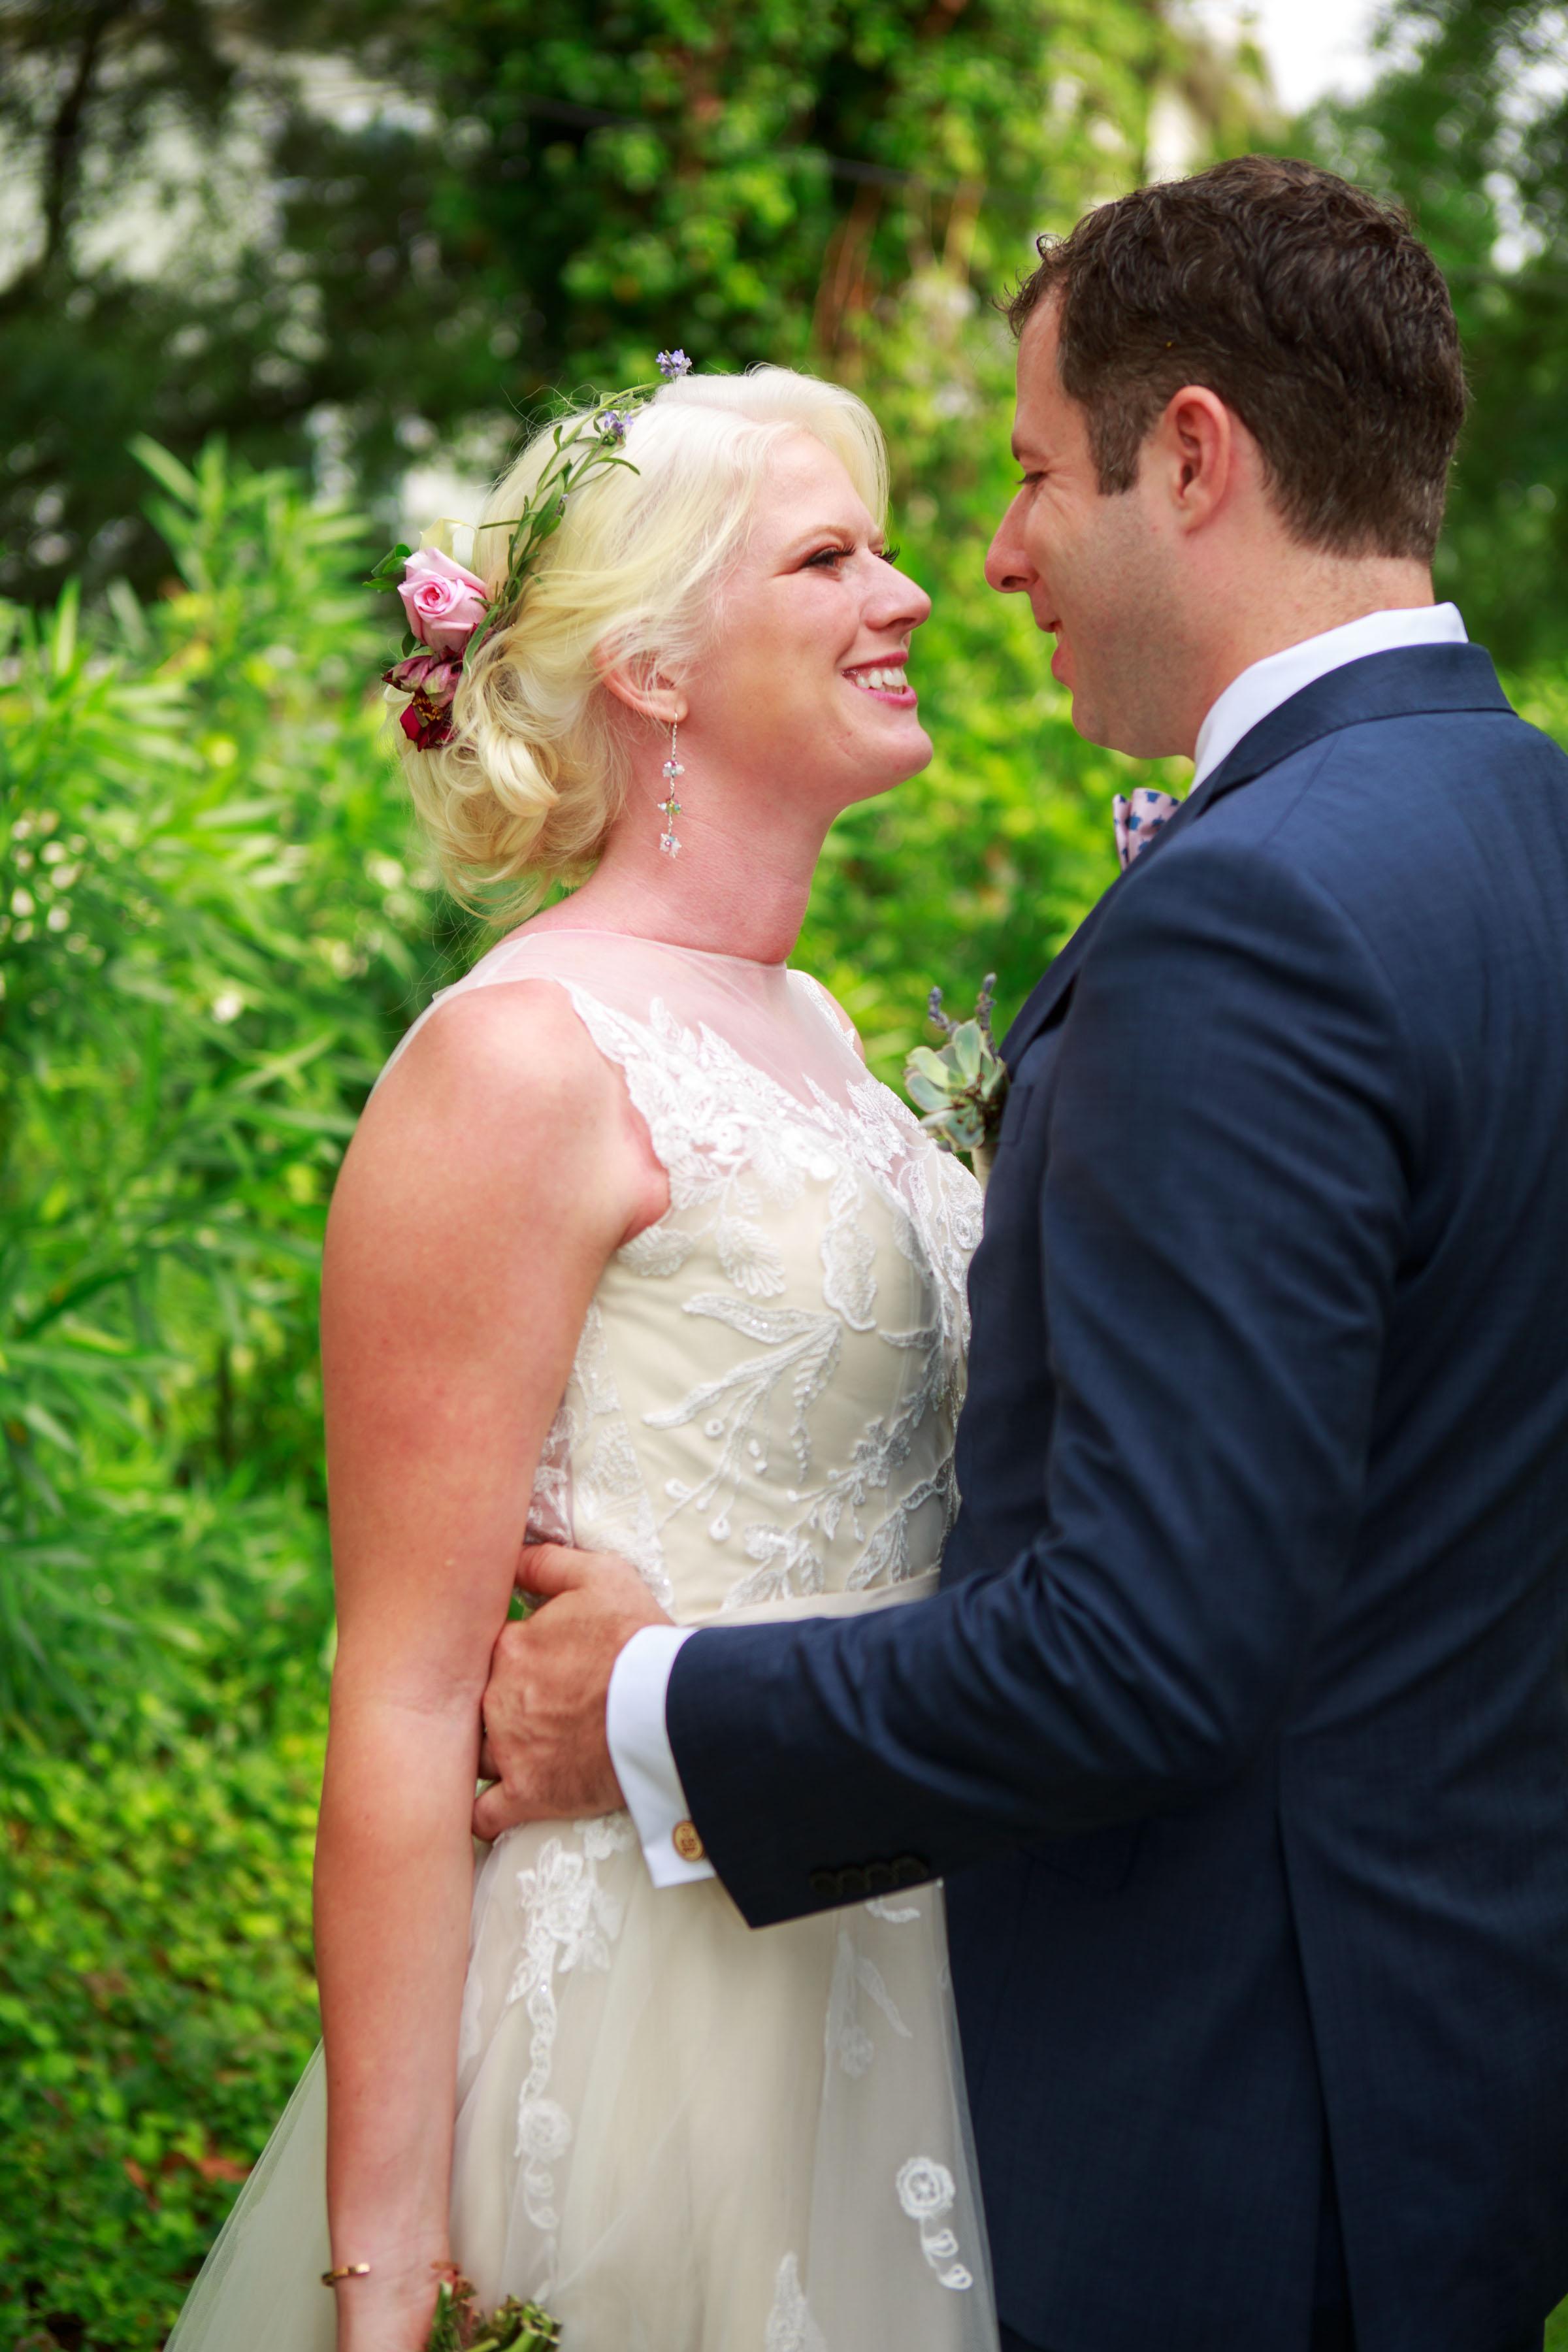 128-South-Wedding-Tiffany-Abruzzo-Photography-Bride-&-Groom-14.jpg